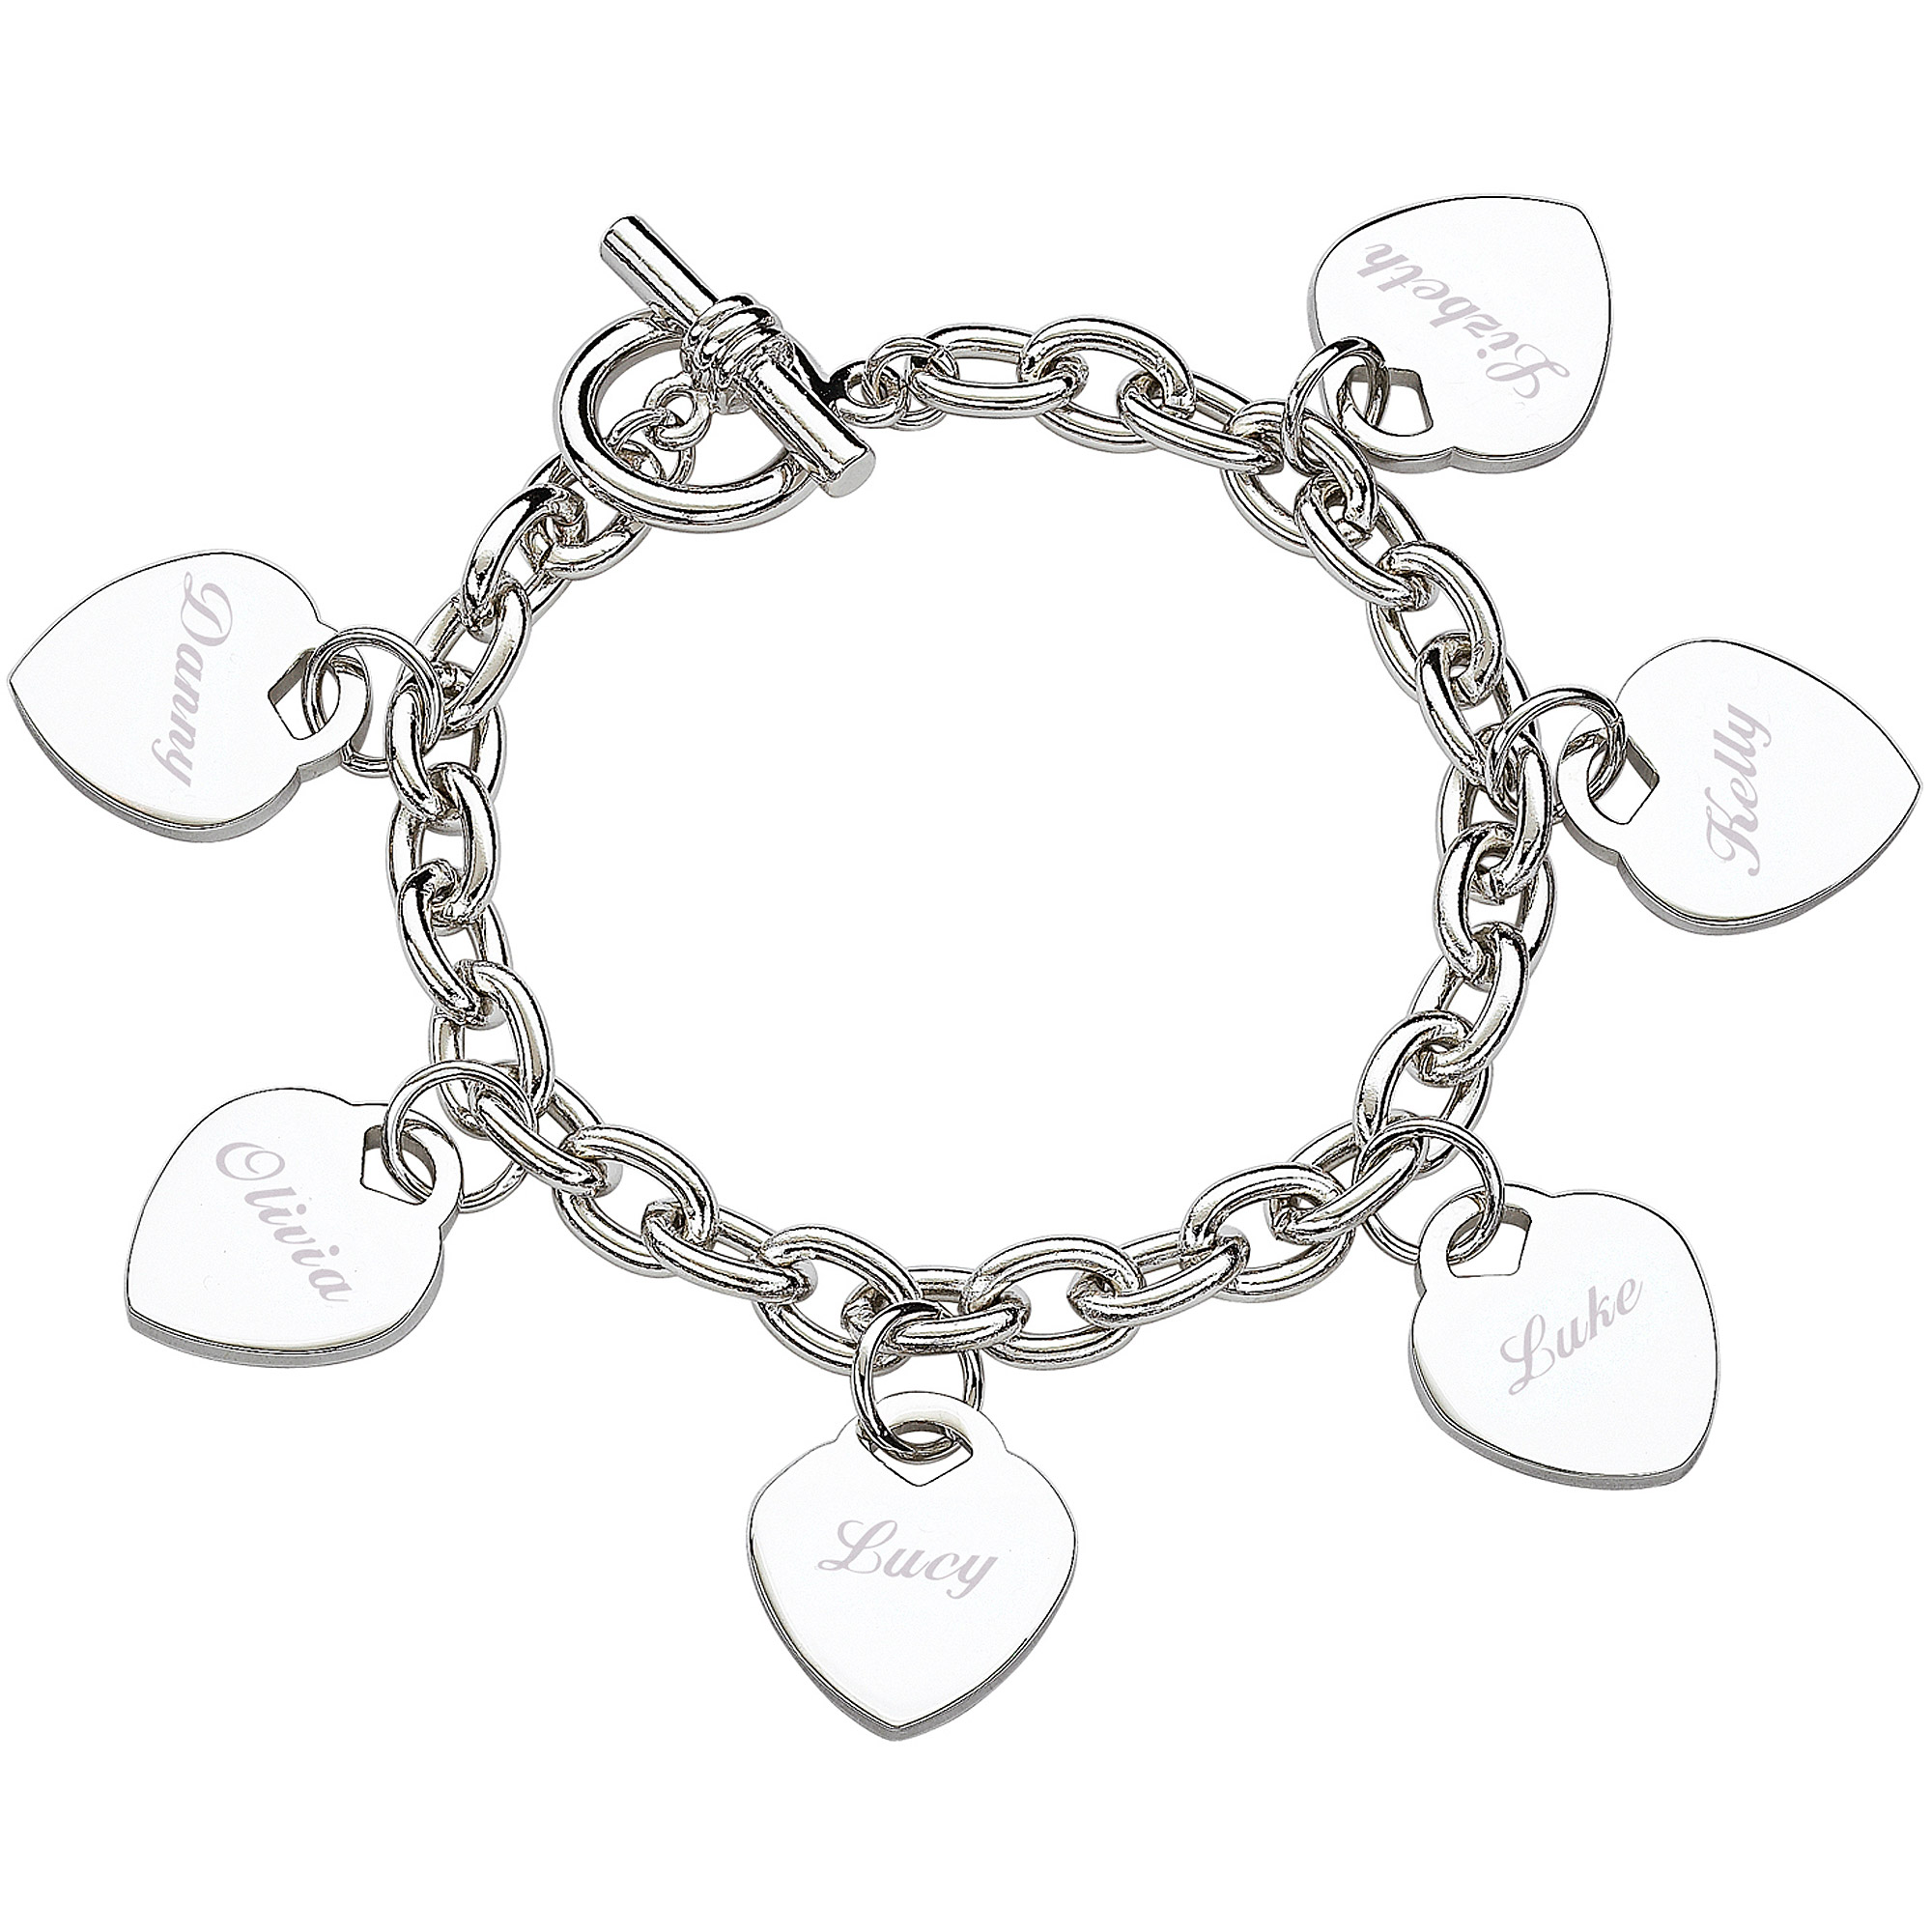 Personalized Silver-Tone Hearts Charm Bracelet